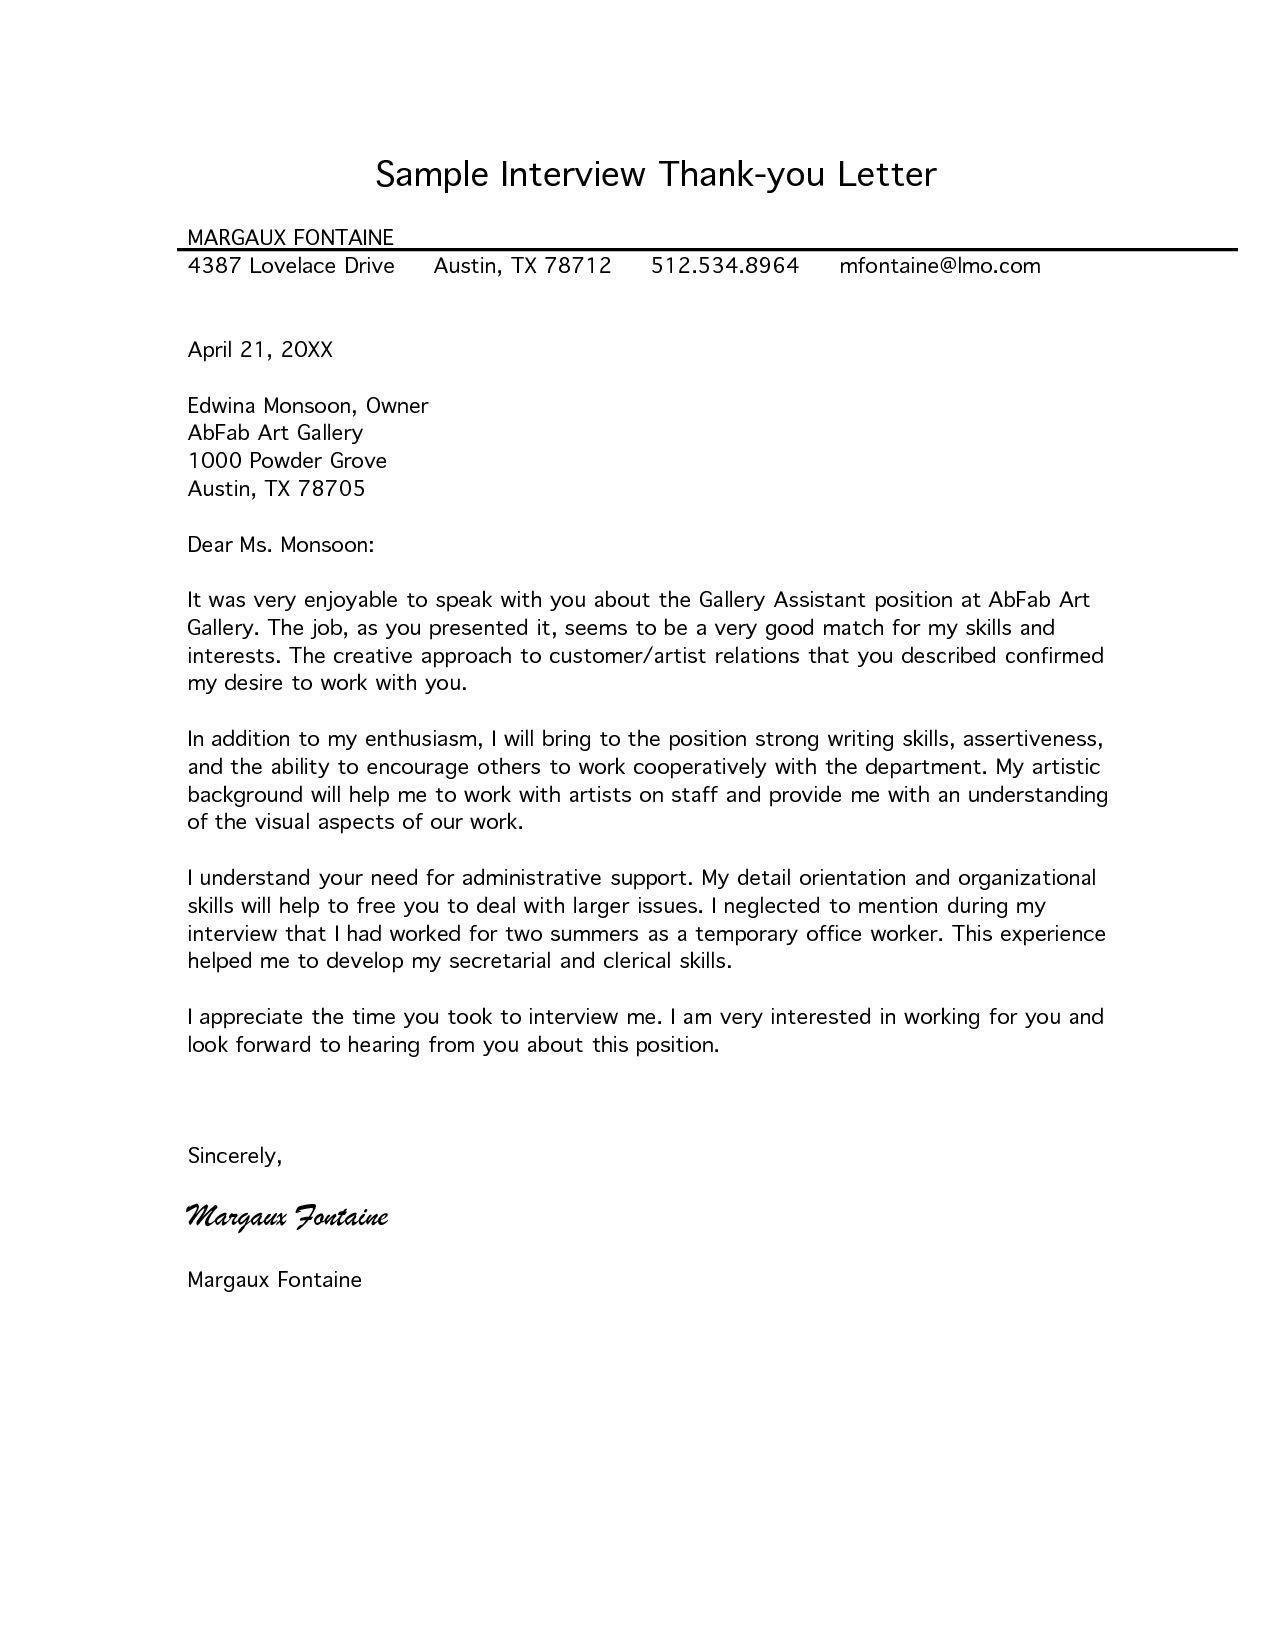 No Notice Resignation Letter Inspirational 5 Resignation Letter